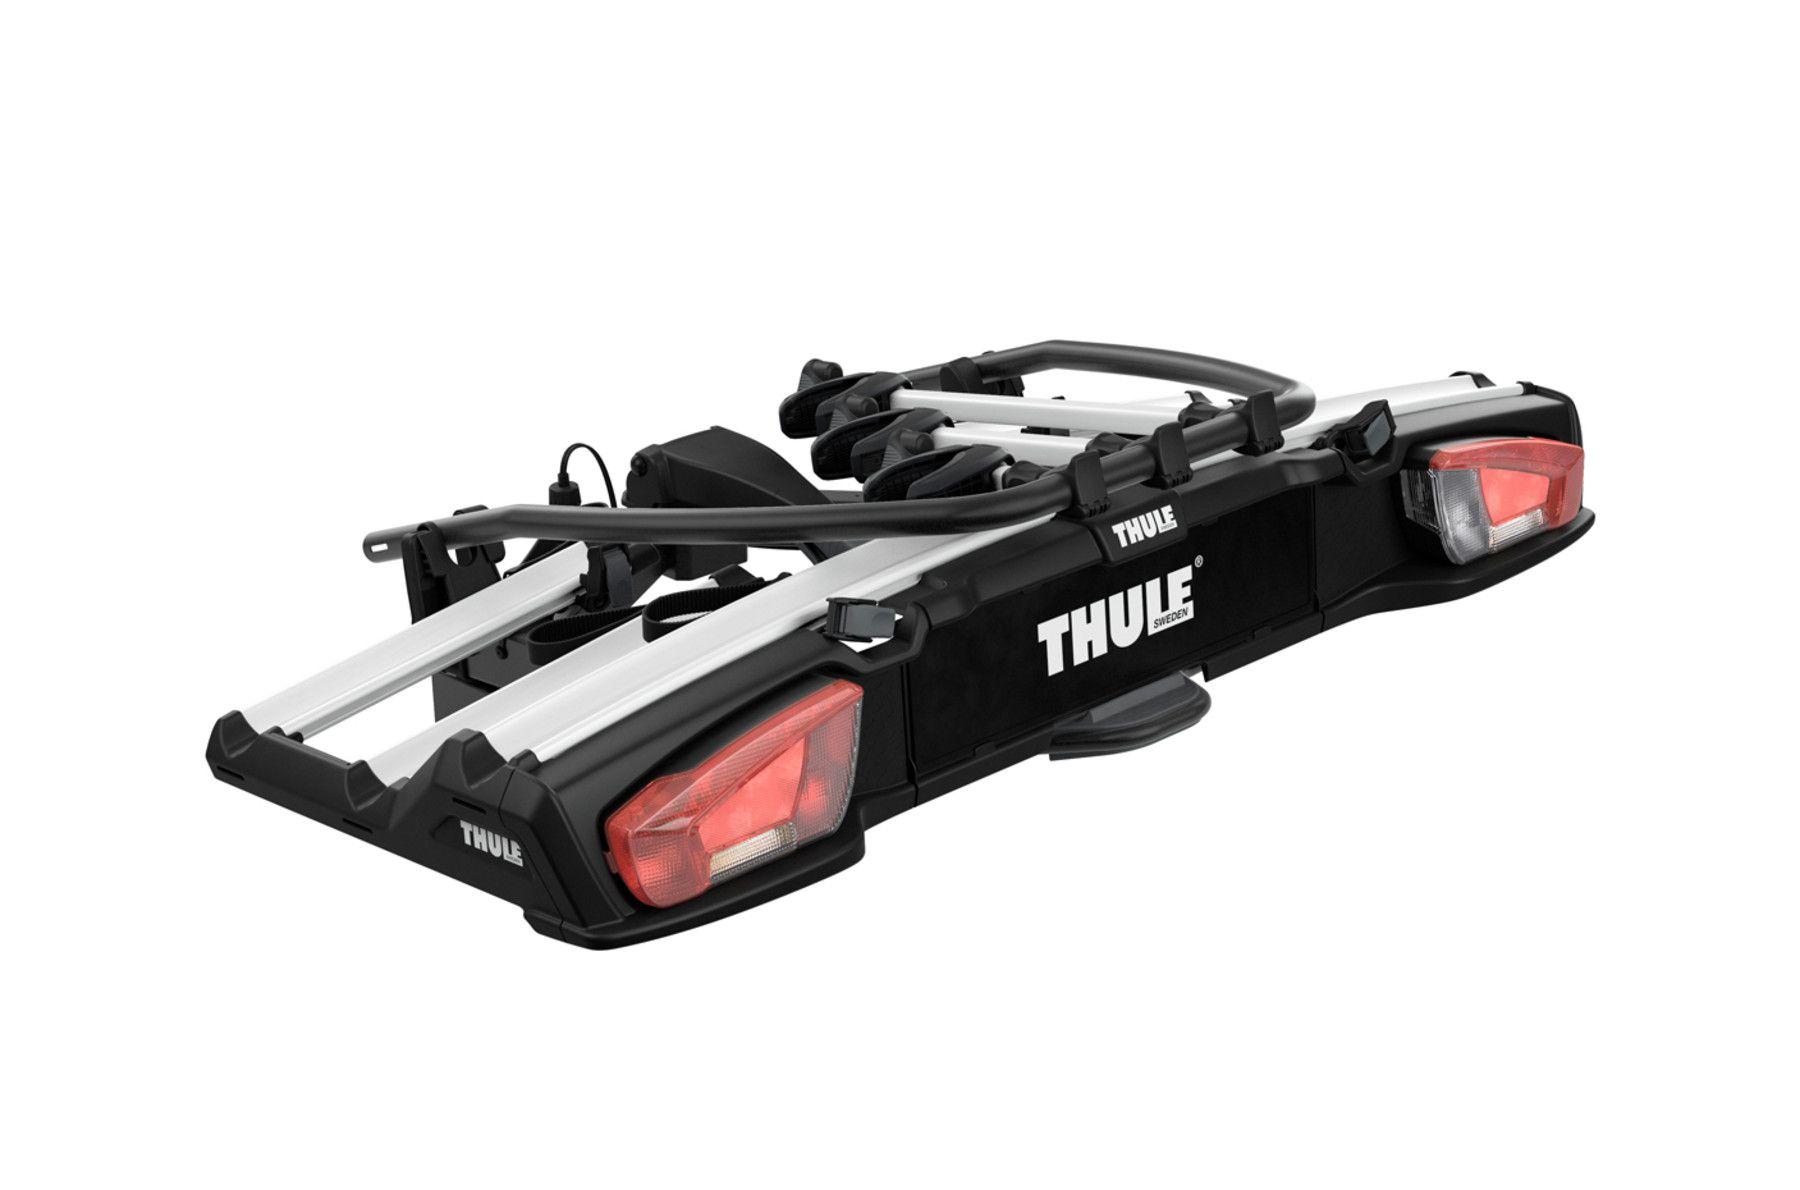 Thule VeloSpace XT 3